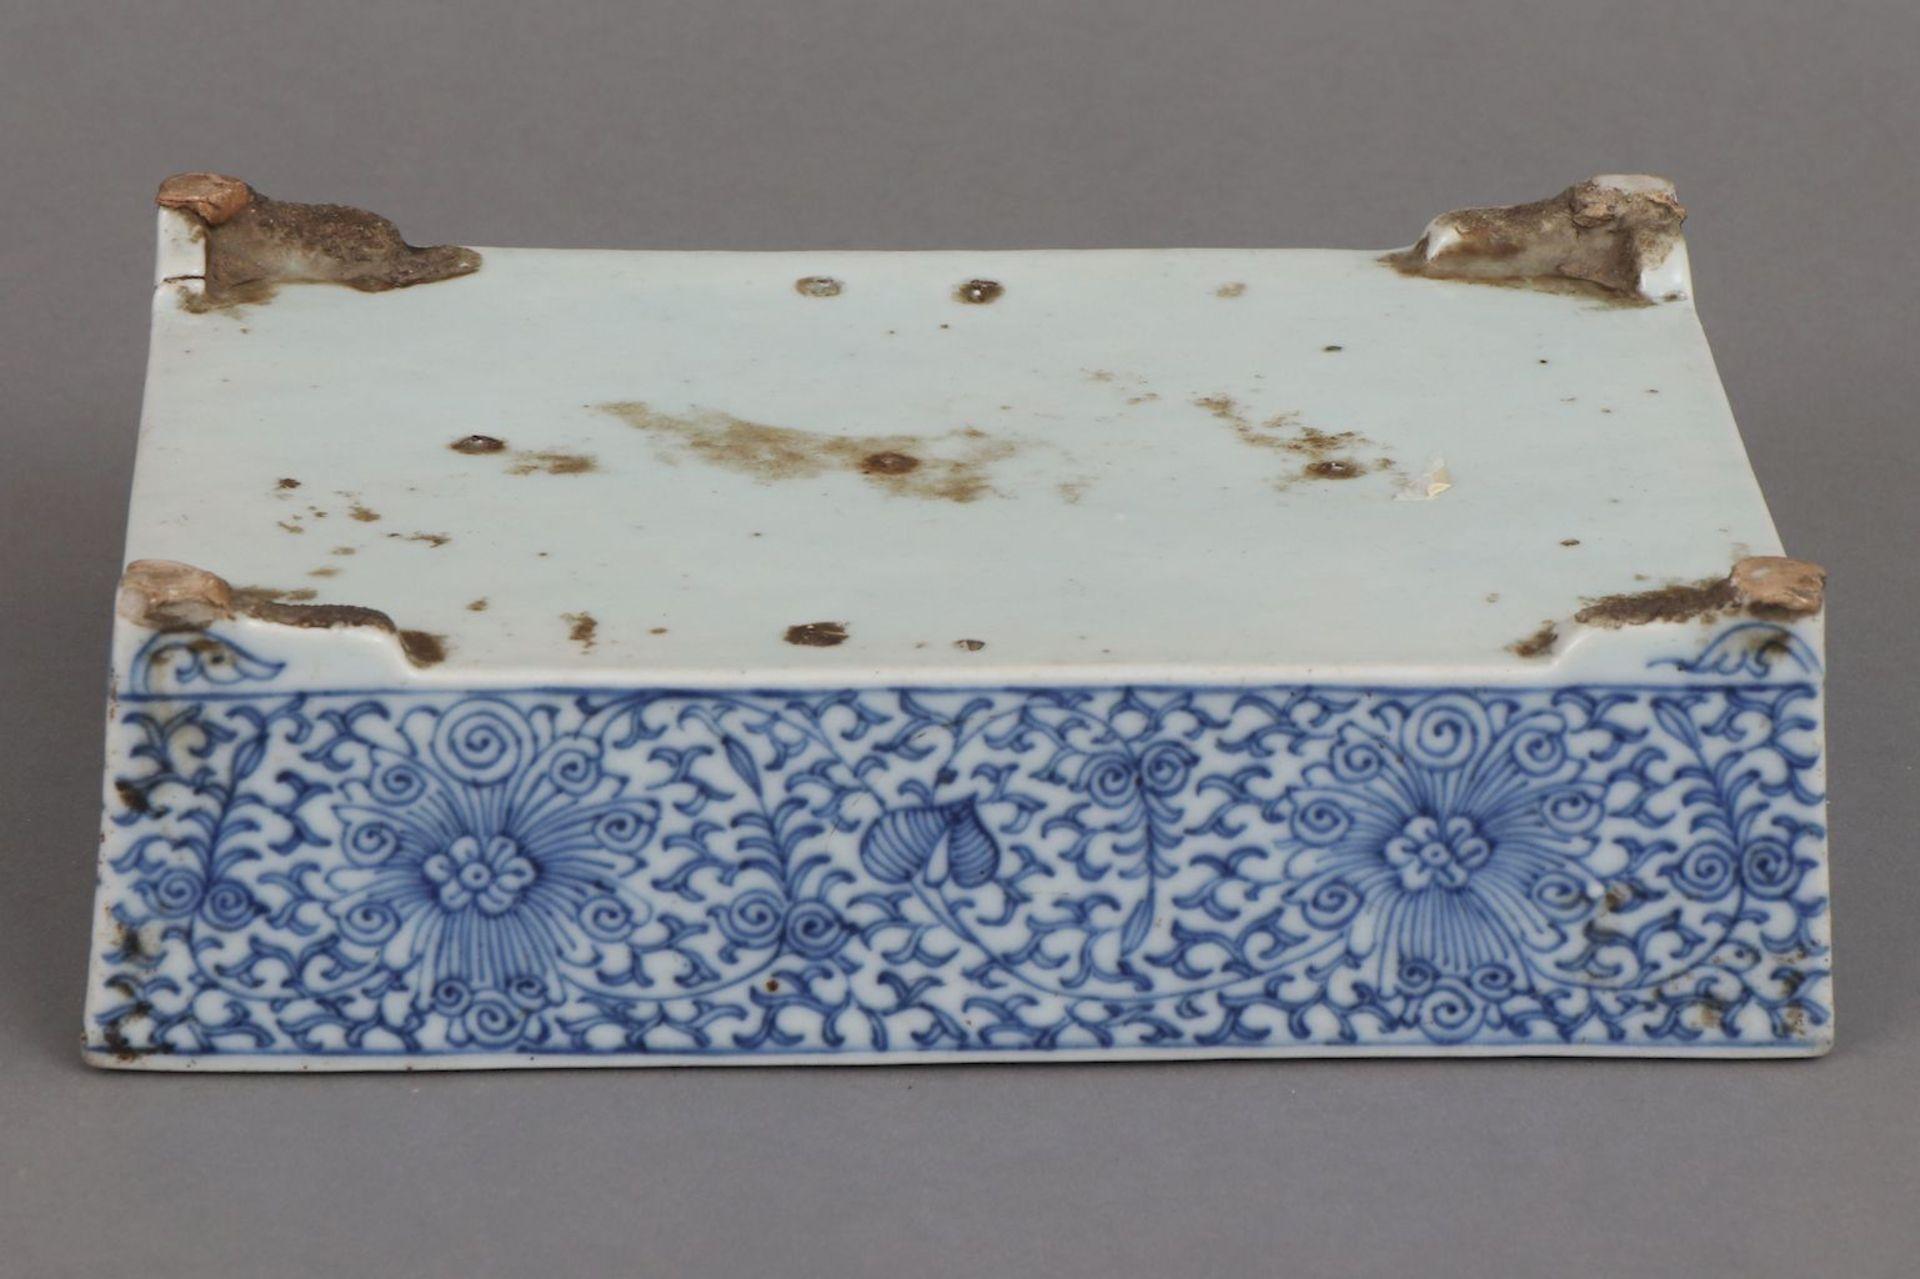 Chinesische Bonsai-Pflanzschale - Image 3 of 4